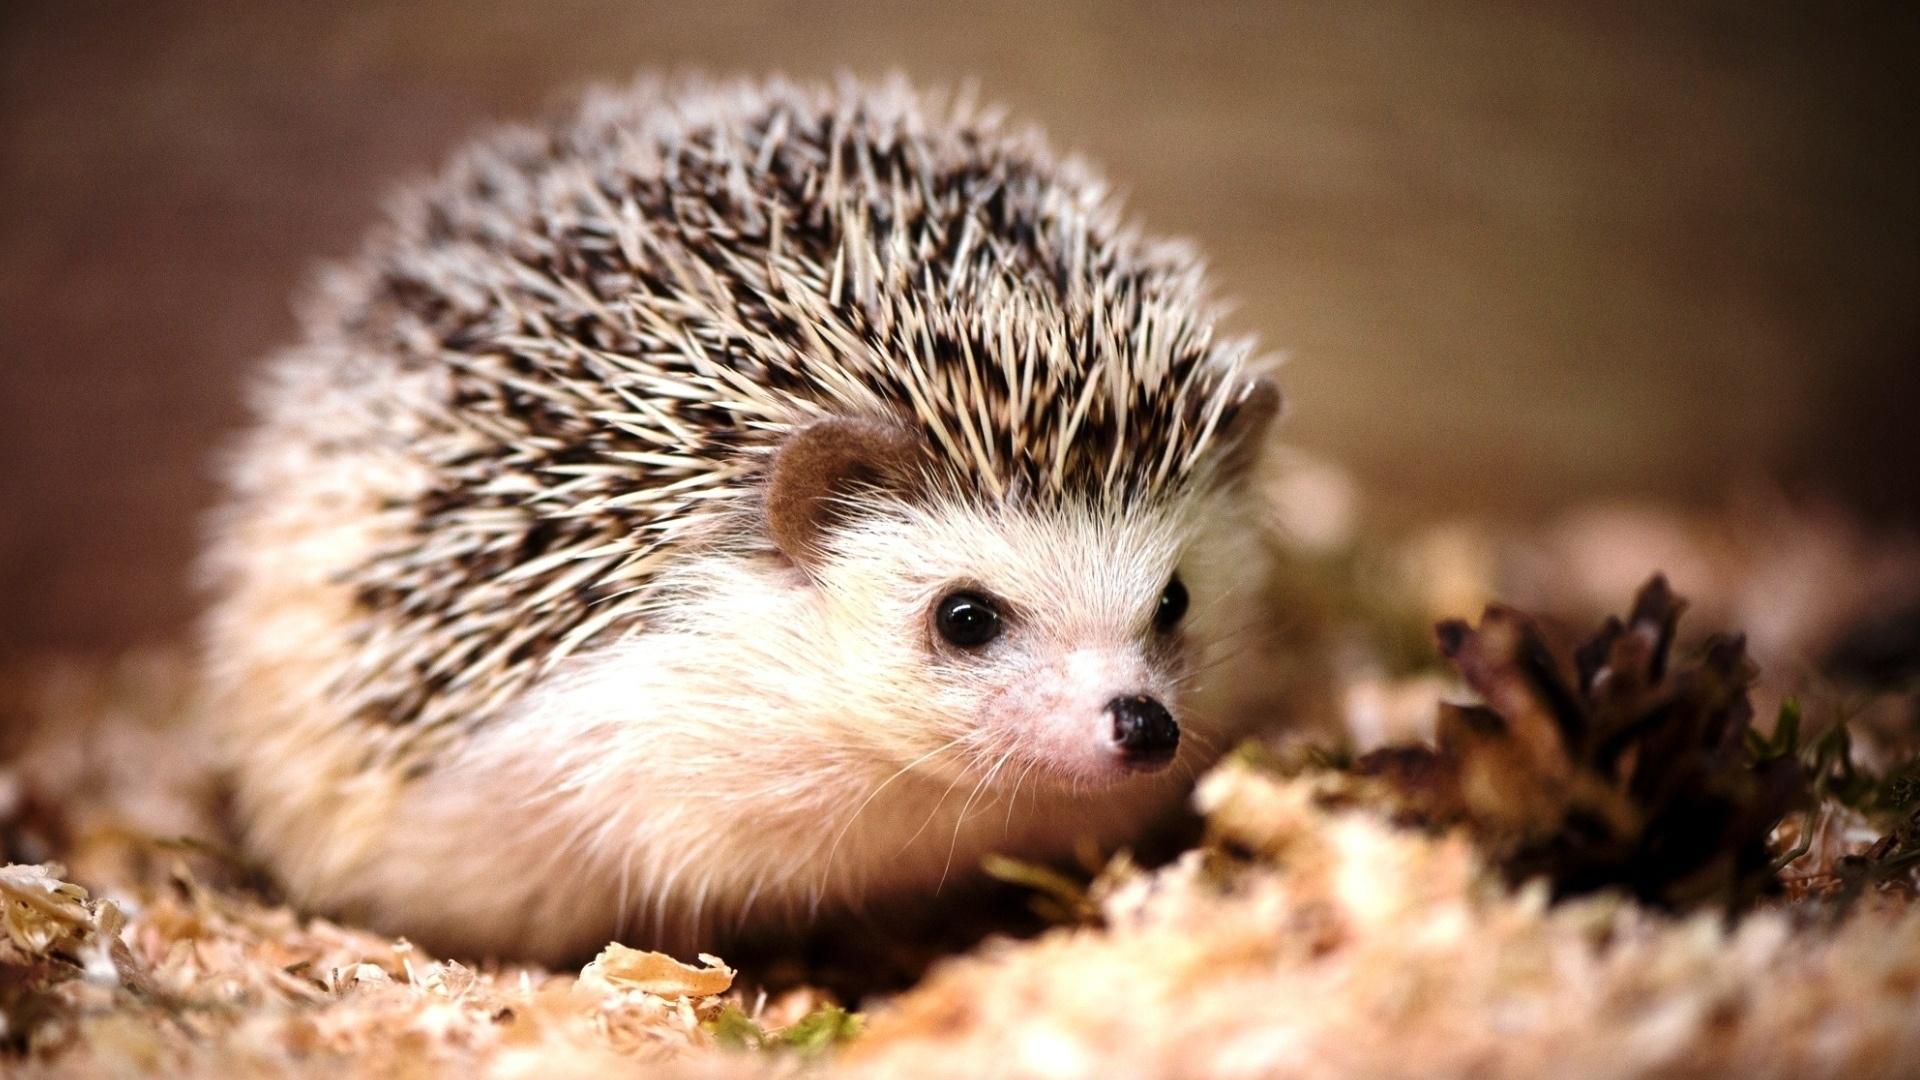 Hedgehog wallpaper for computer